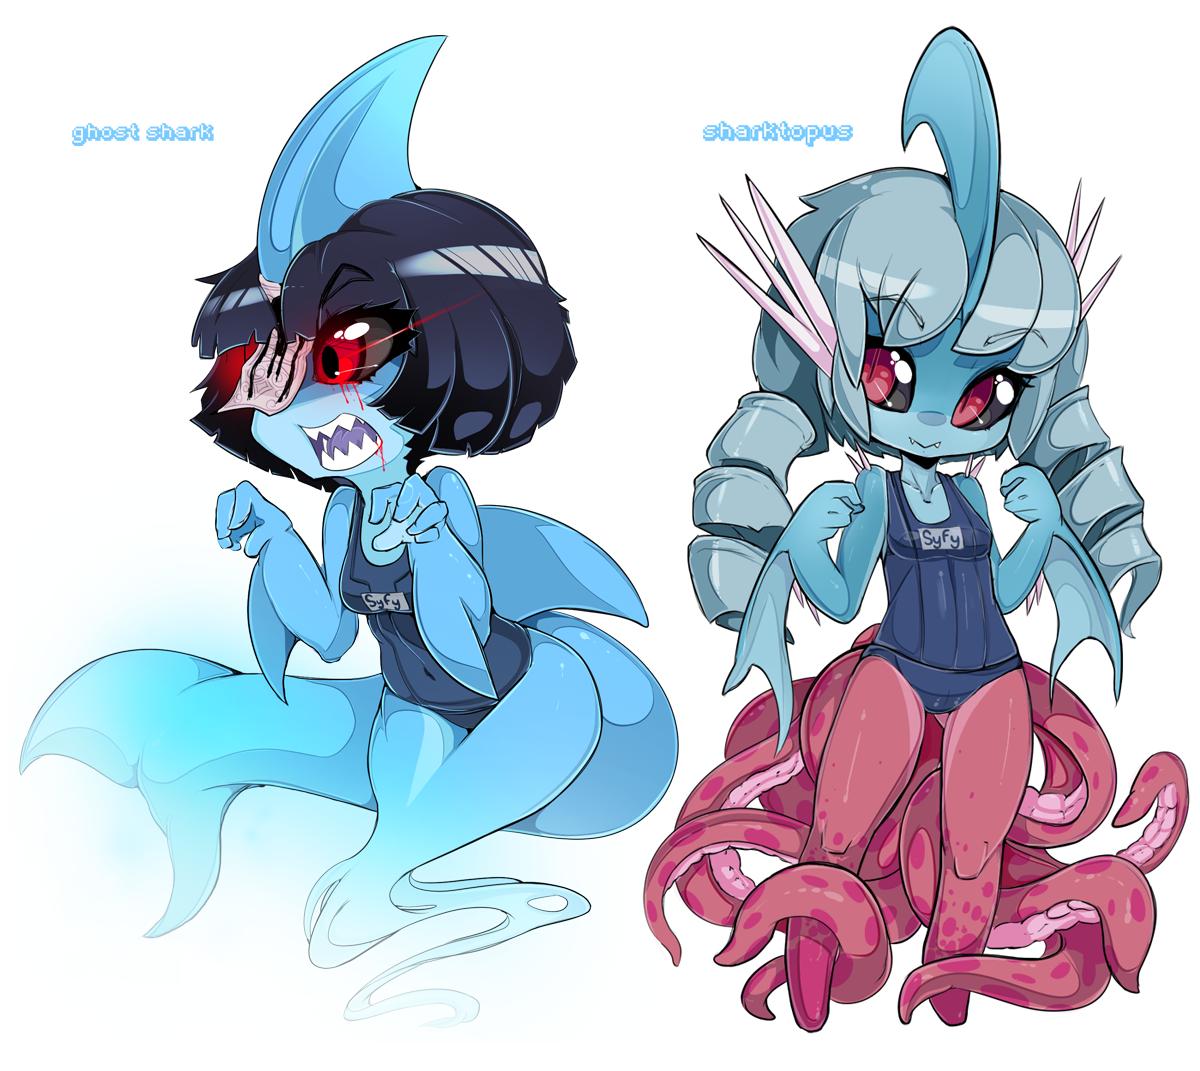 Syfy Sharks - Ghost Shark / Sharktopus by Slugbox